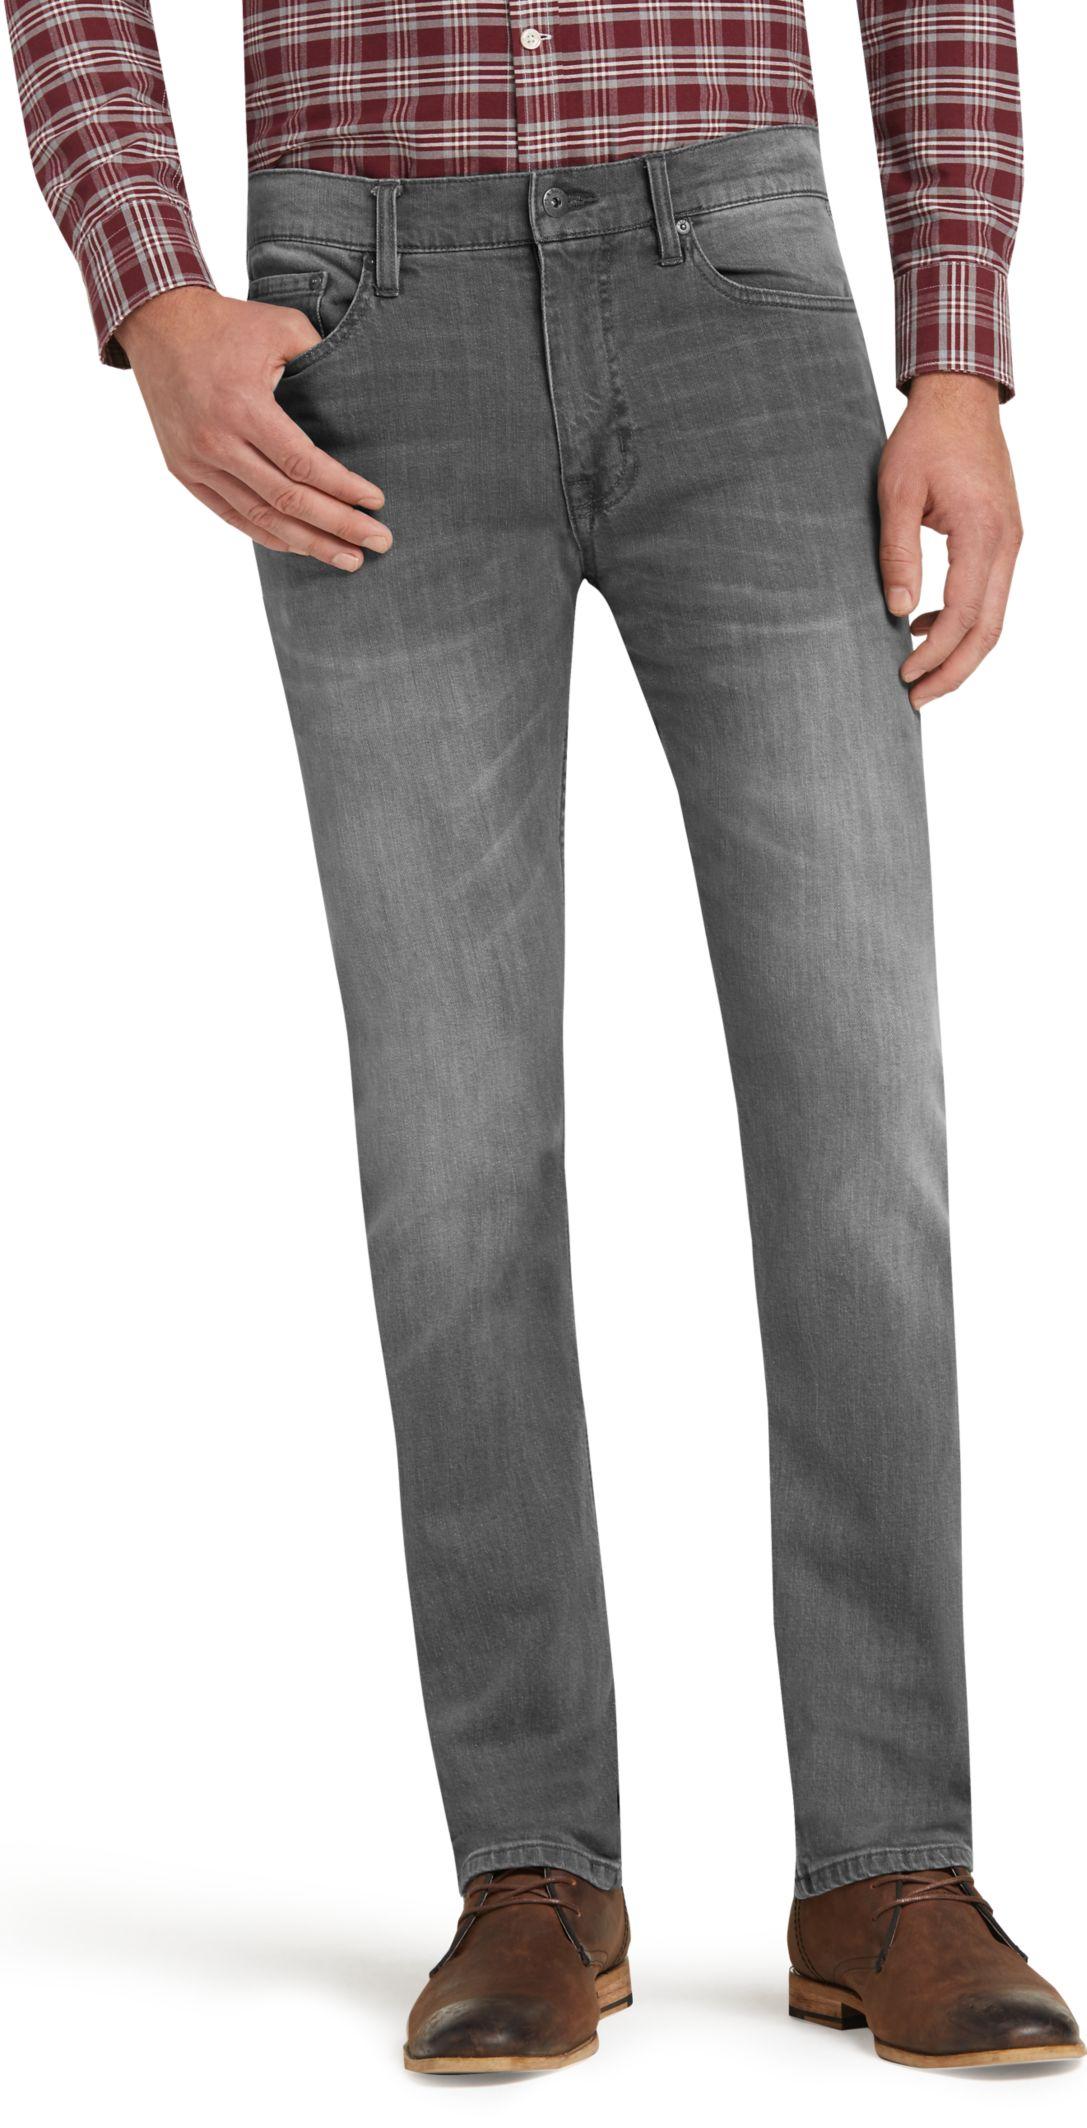 a629d03d905 1905 Collection Tailored Fit Jeans - Men s Casual Pants